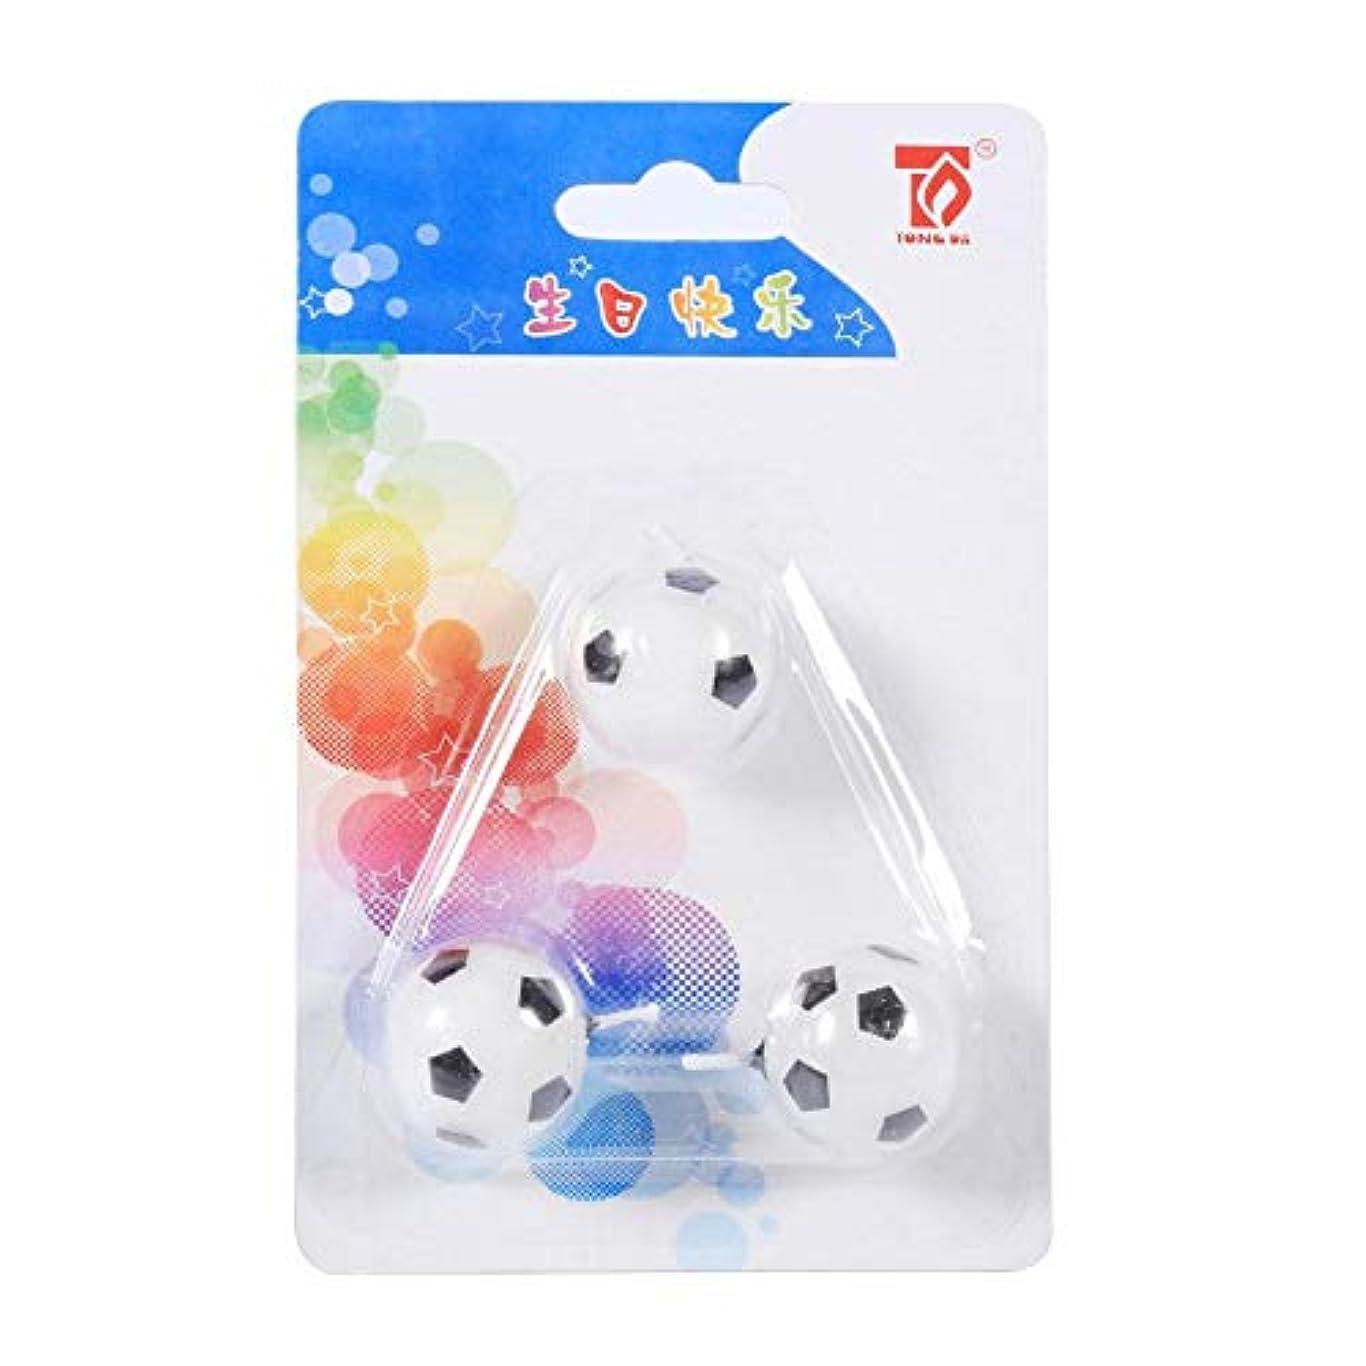 Eboxer キャンドル サッカーボールキャンドル キャンドル誕生日 子供向 3個入 サッカーボールの形 誕生日 パーティケーキのキャンドル 飾り物 可愛い